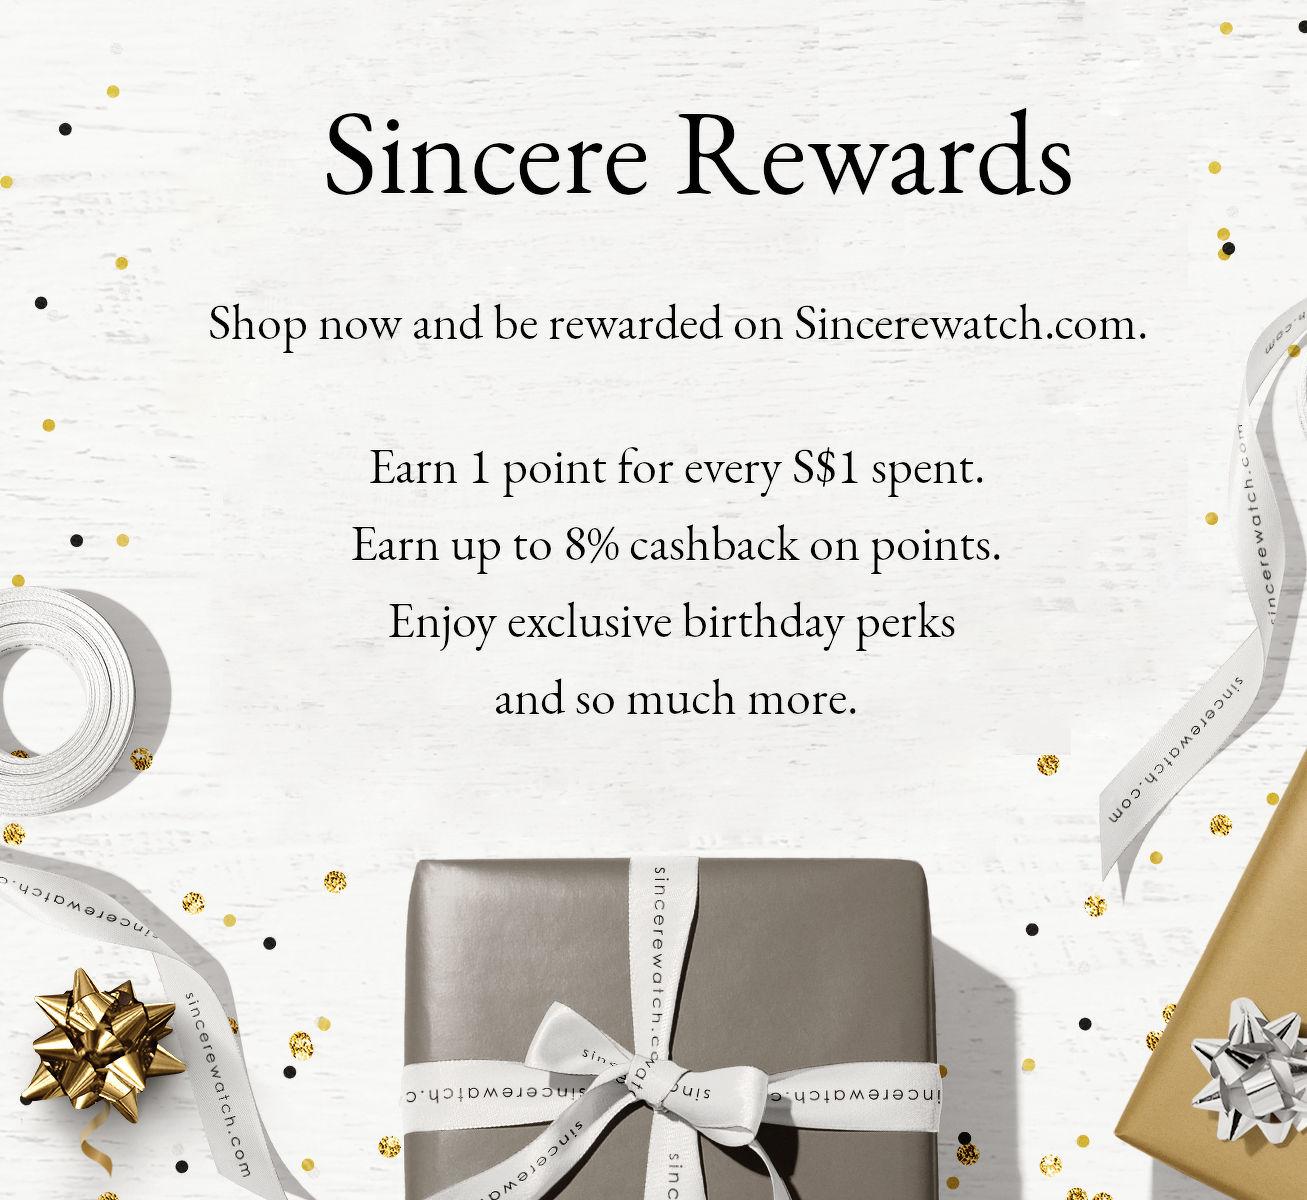 Sincere Rewards - THE EDGE SINGAPORE